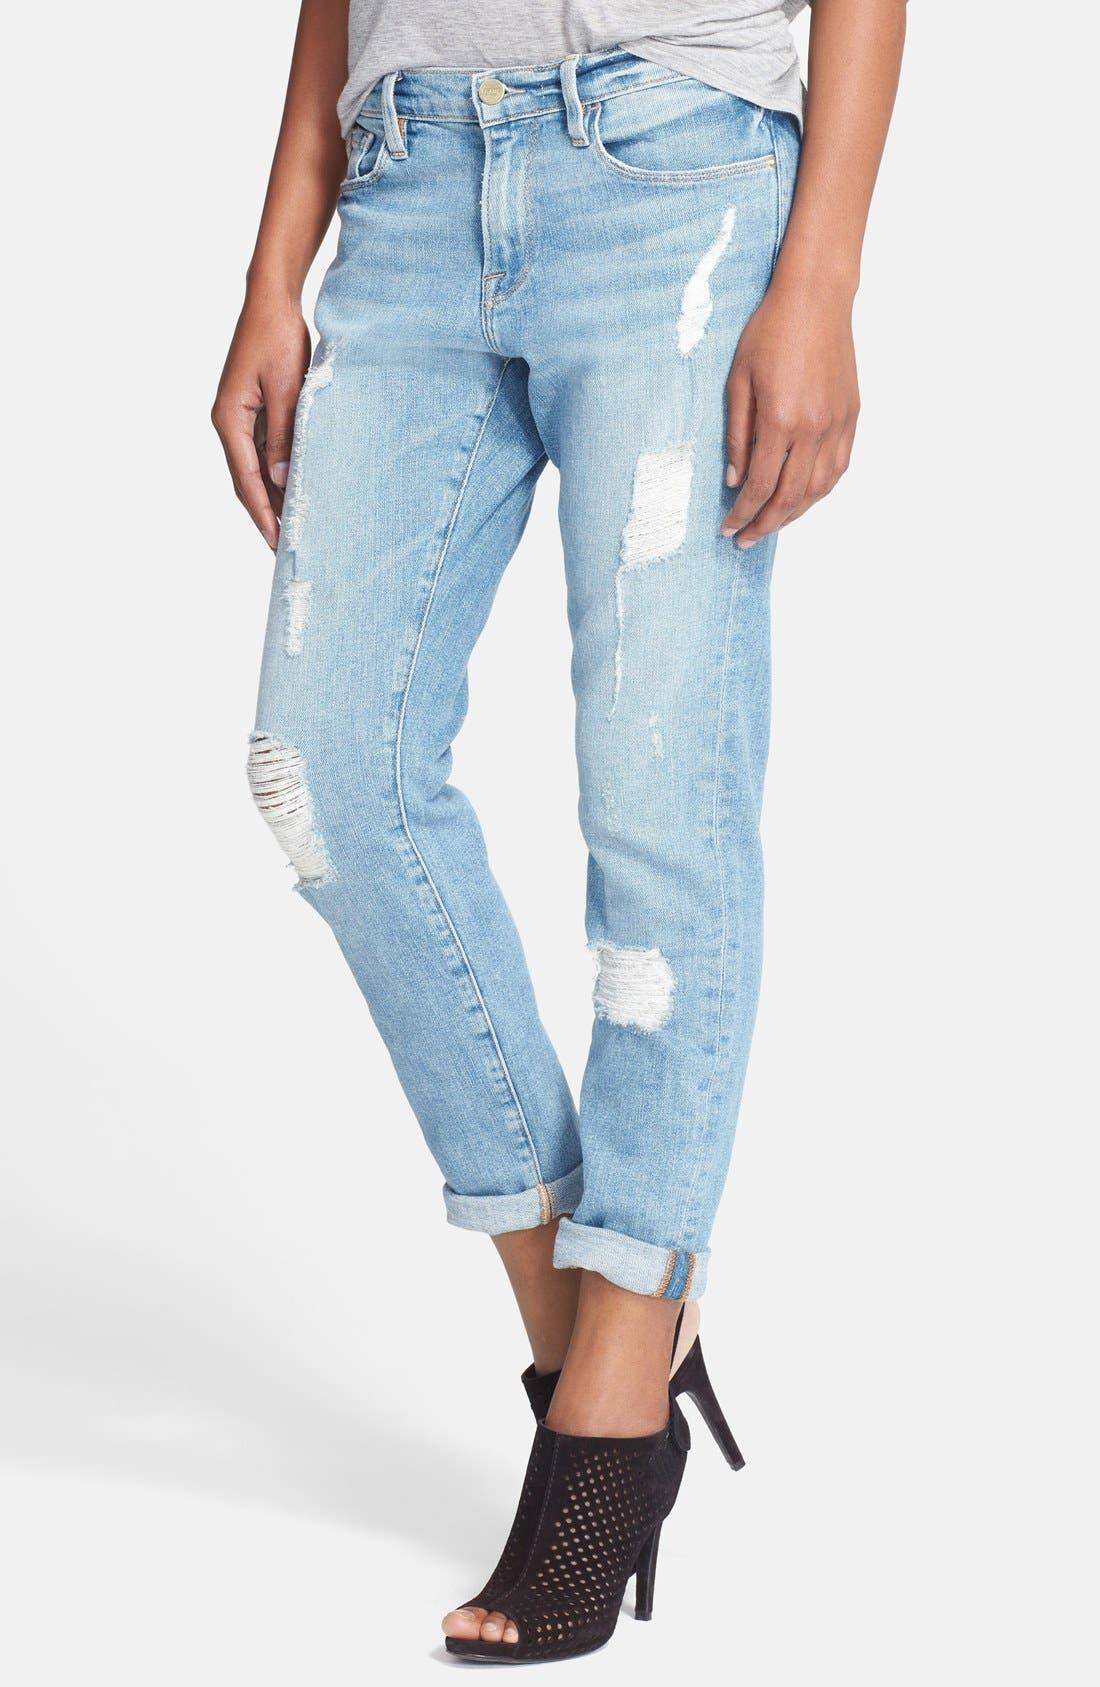 Alternate Image 1 Selected - Frame Denim 'Le Garcon' Boyfriend Jeans (Beek Street)